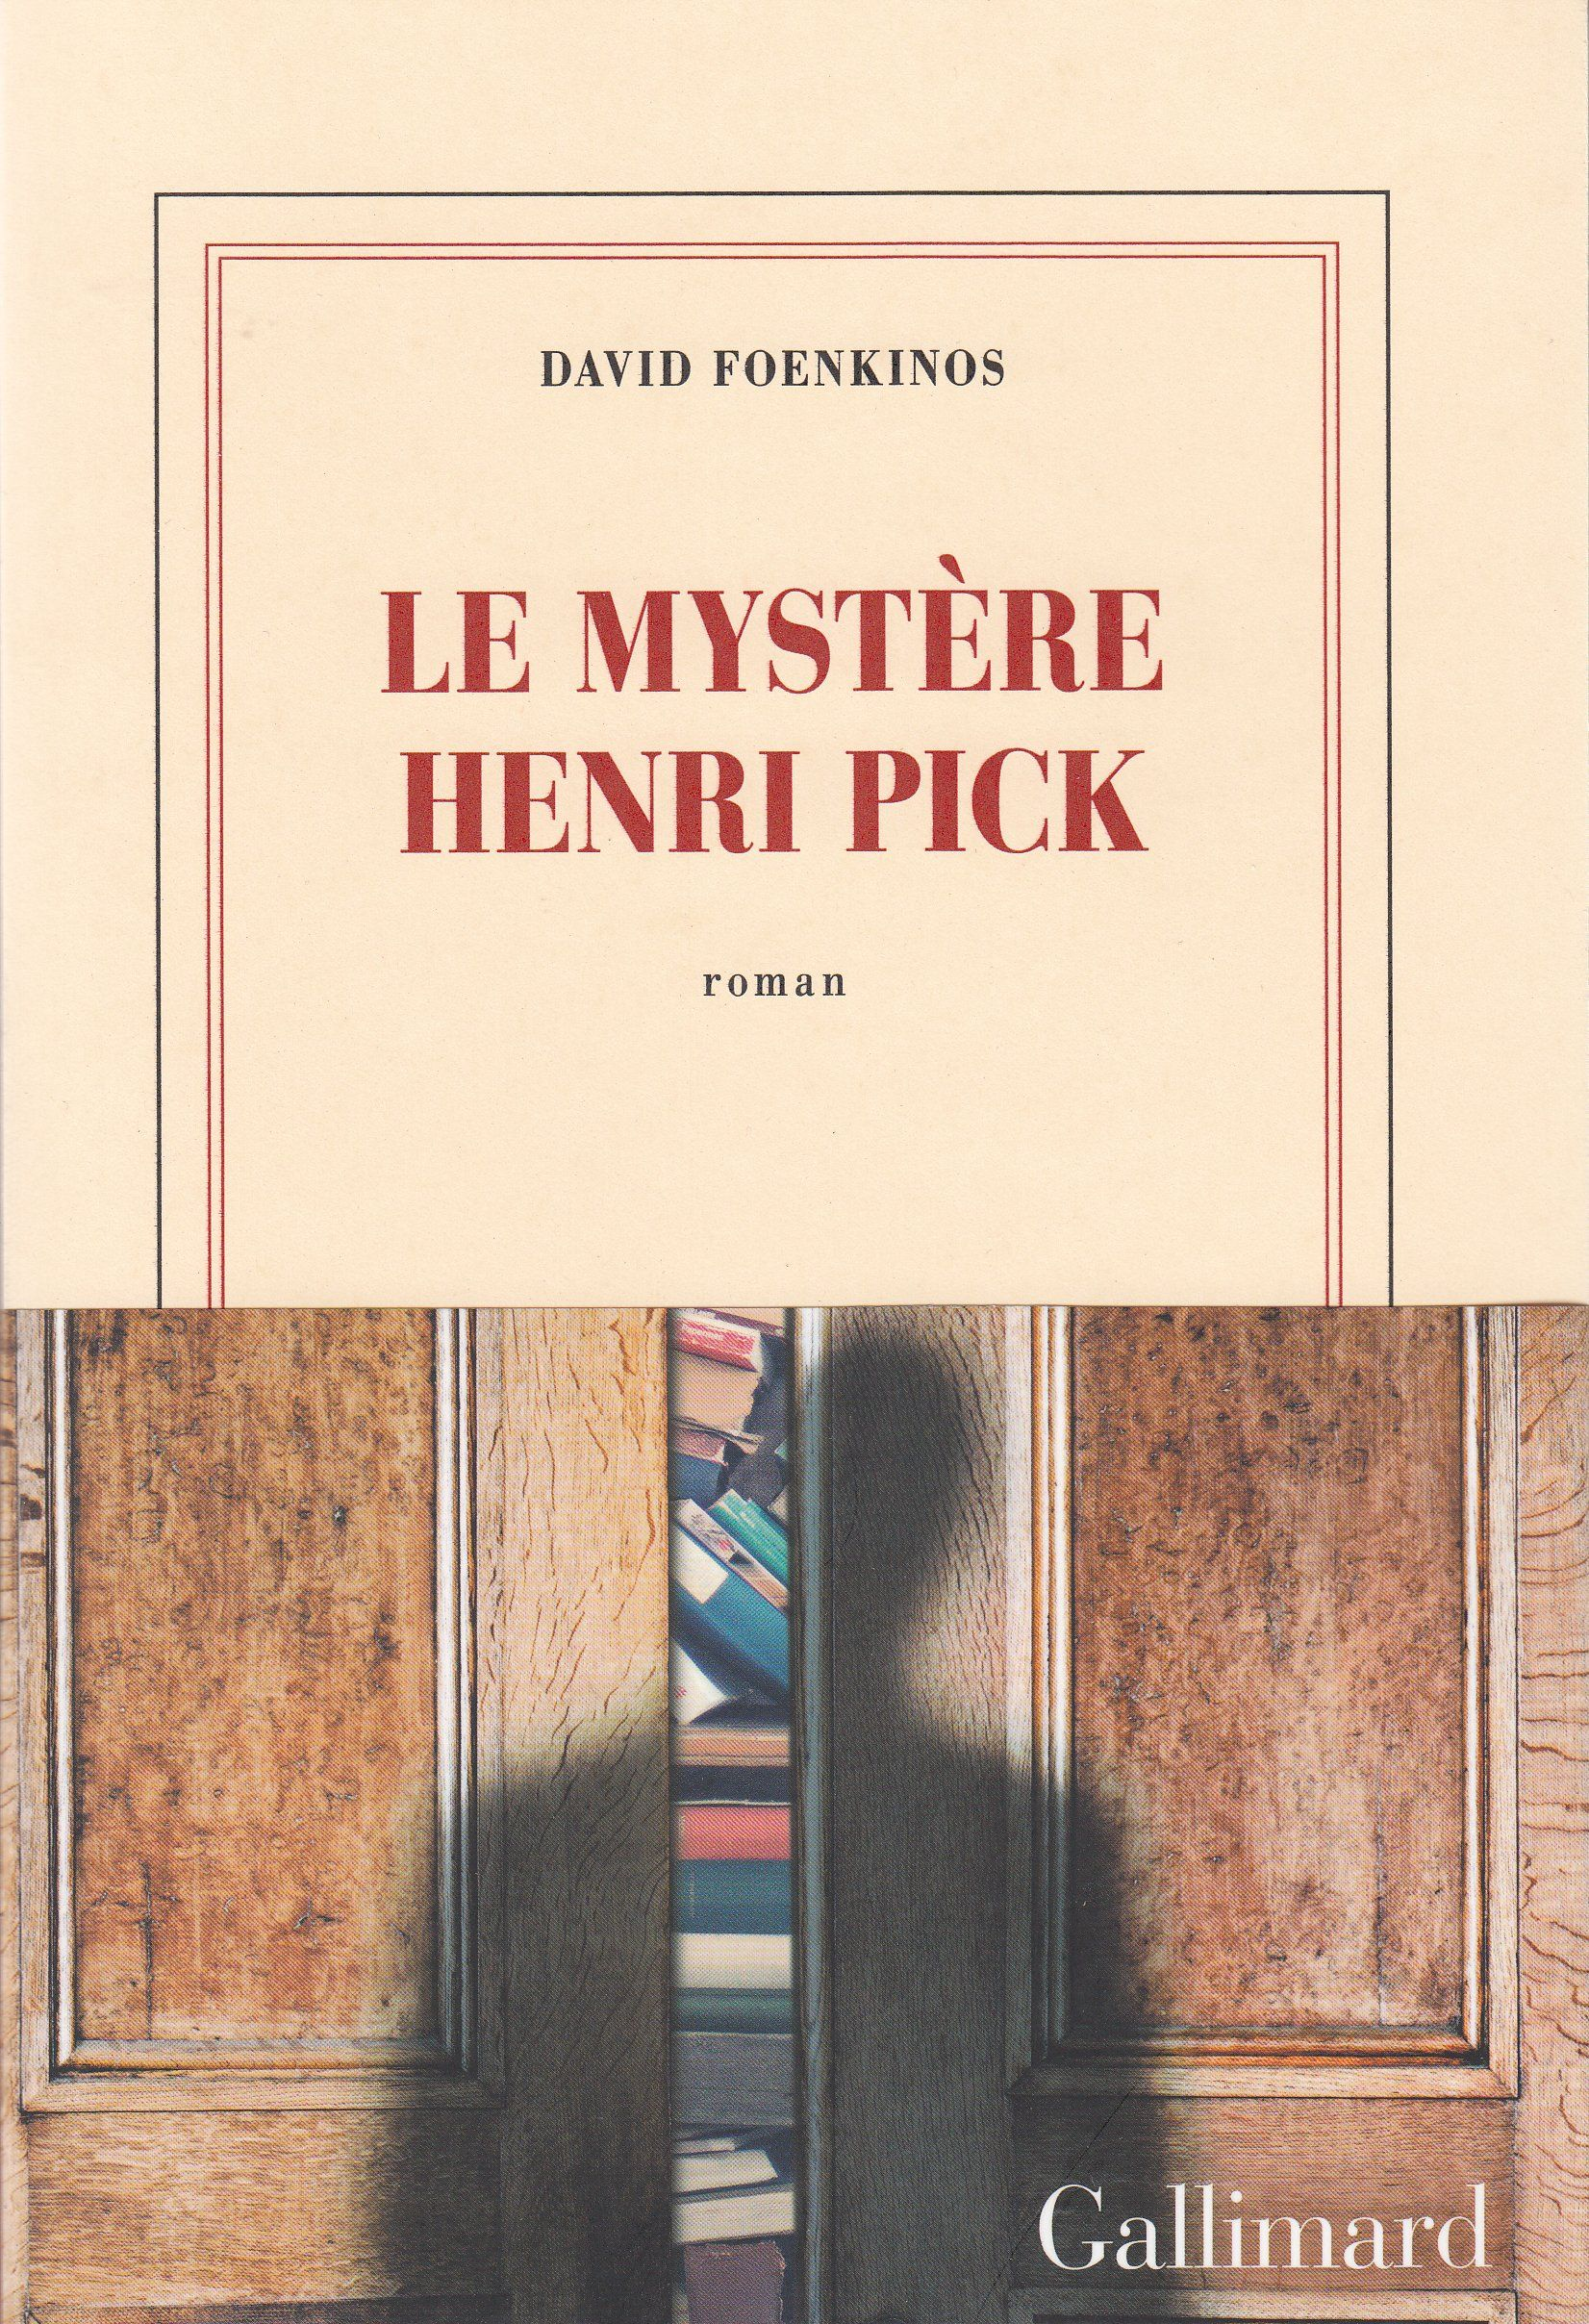 Le Mystère Henri Pick David Foenkinos Gallimard 2016 Pdf Books Download Books To Read Online Pdf Books